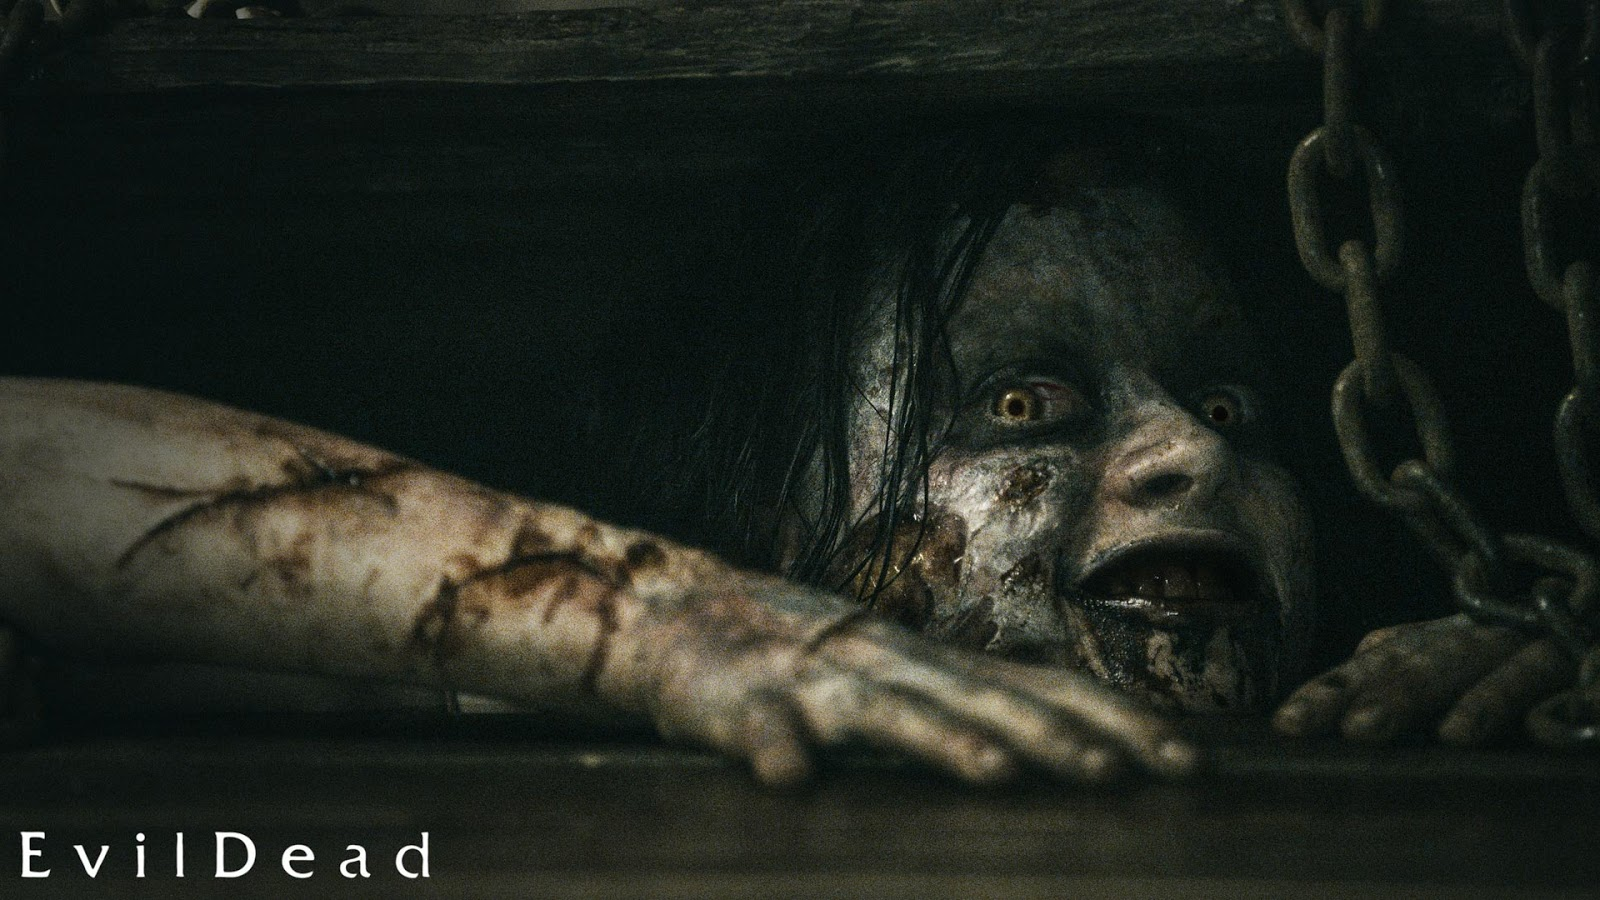 http://4.bp.blogspot.com/-D7kwe2HxufM/UKmh9zCnTwI/AAAAAAAAHUA/aVcgSpxQ_7k/s1600/evil-dead-2013-movie-poster.jpg